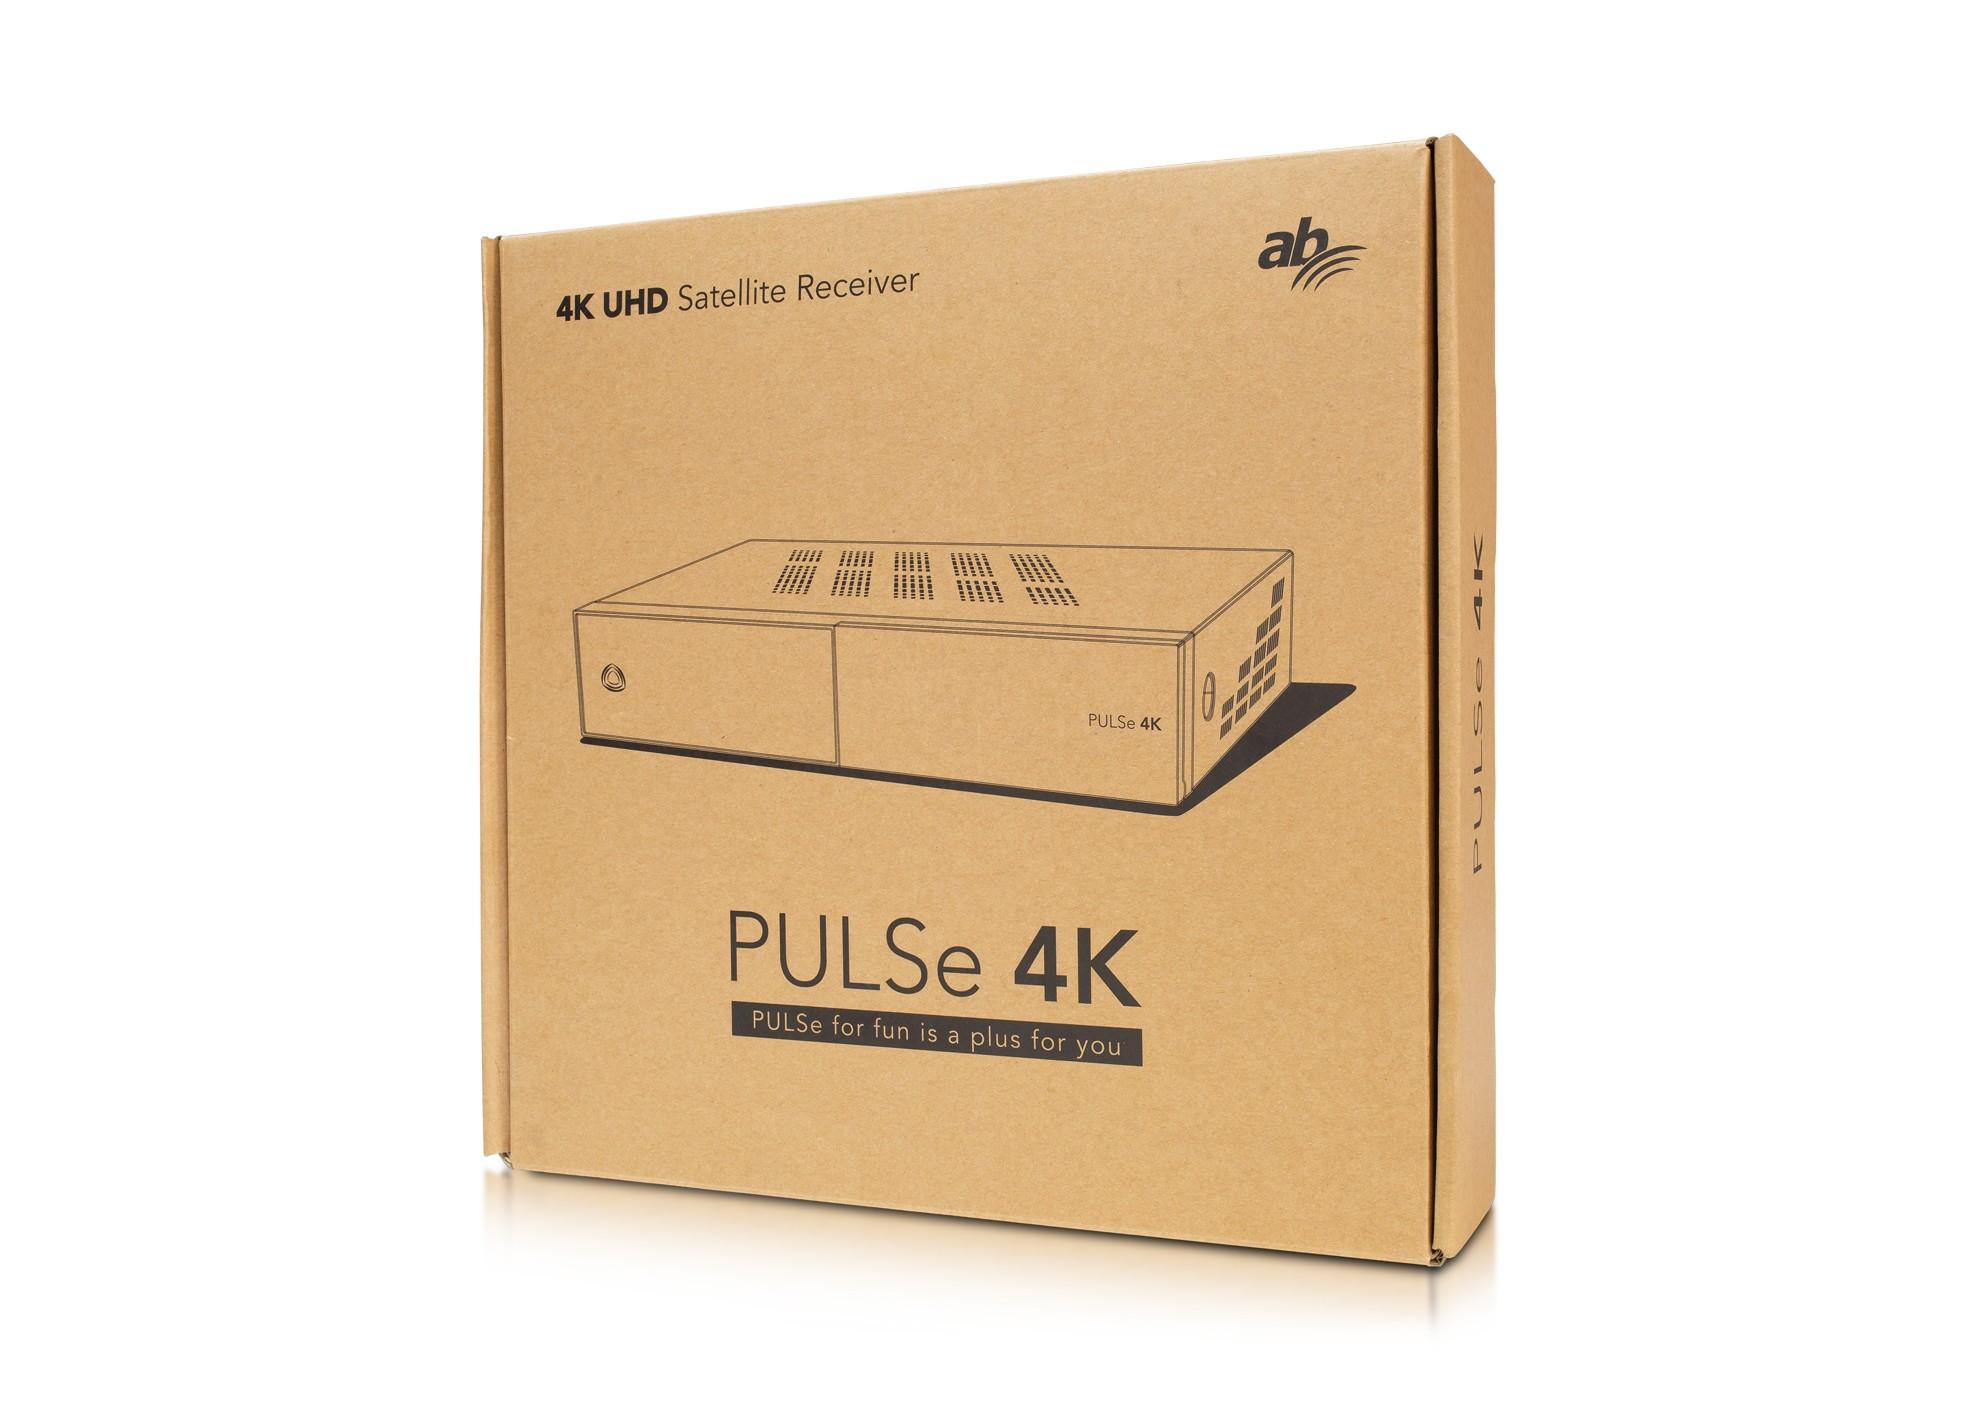 AB PULSe 4K (1x tuner DVB-S2X + 1x tuner DVB-T2/C)